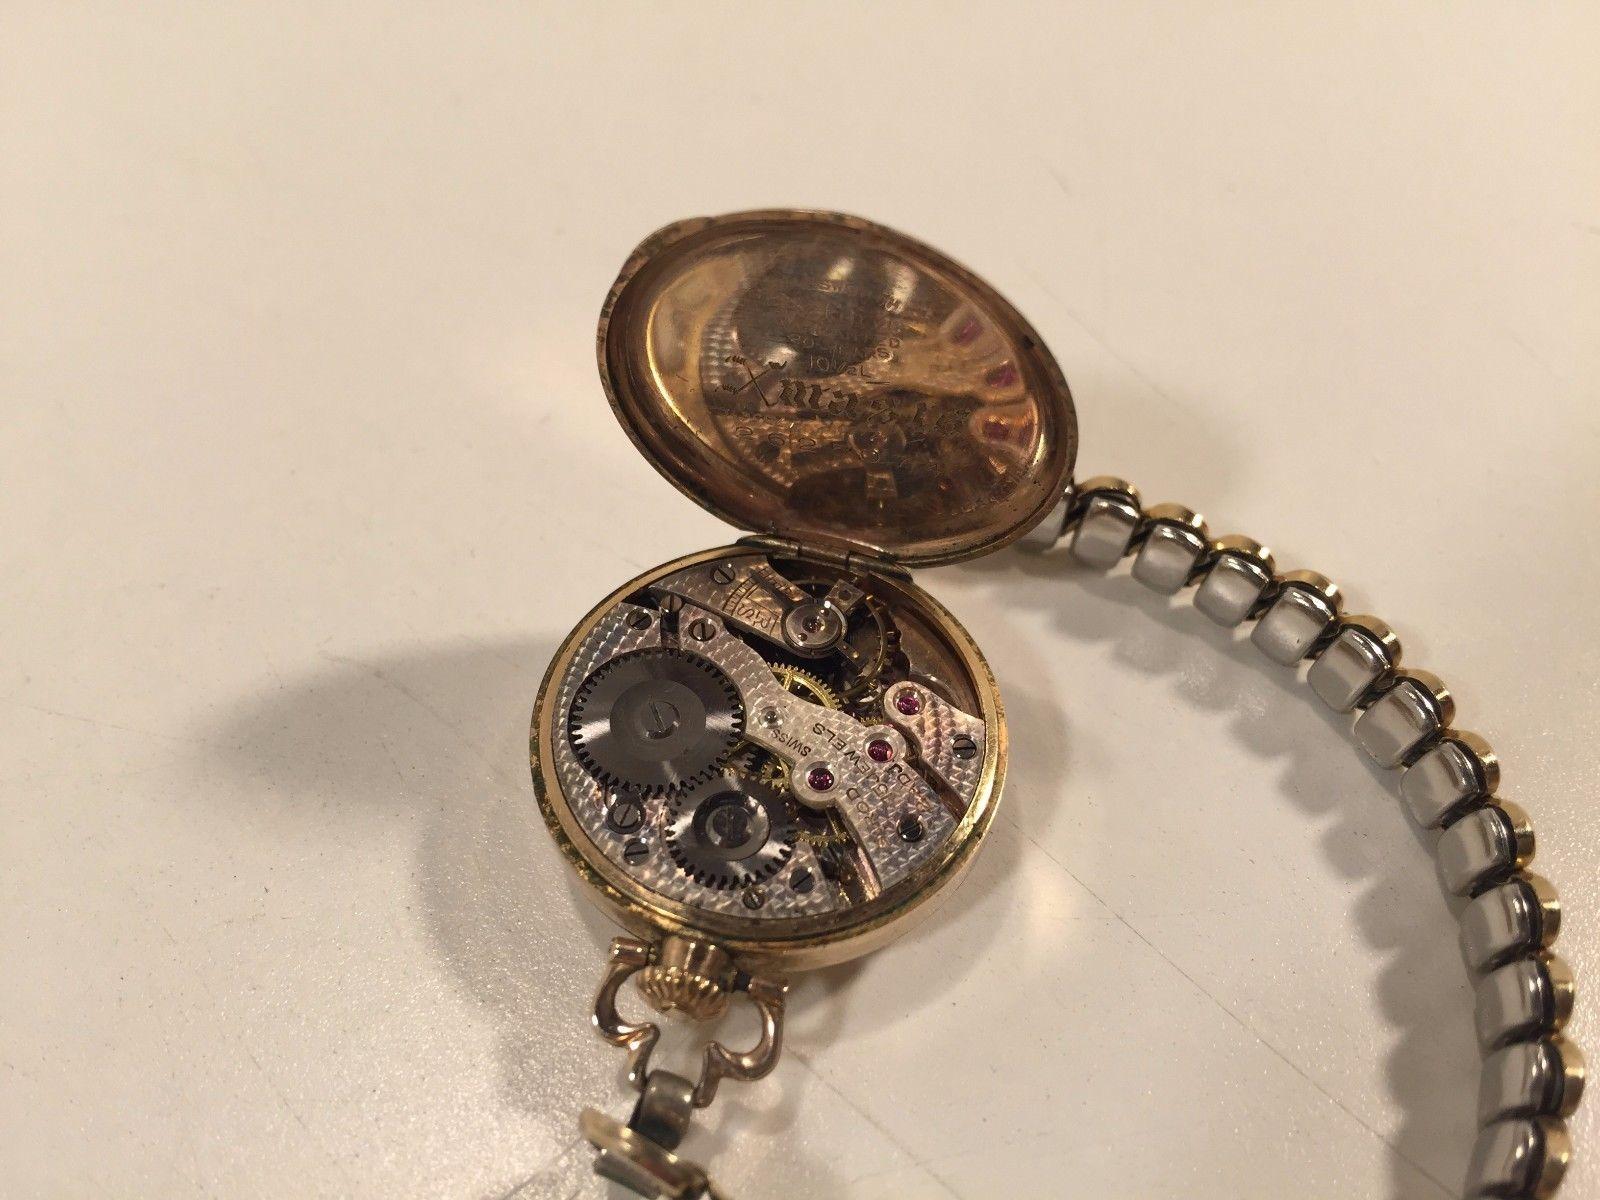 Vintage 1916 Wadsworth Referee Gold Filled 10-1/2L Working 15 Jewels Swiss